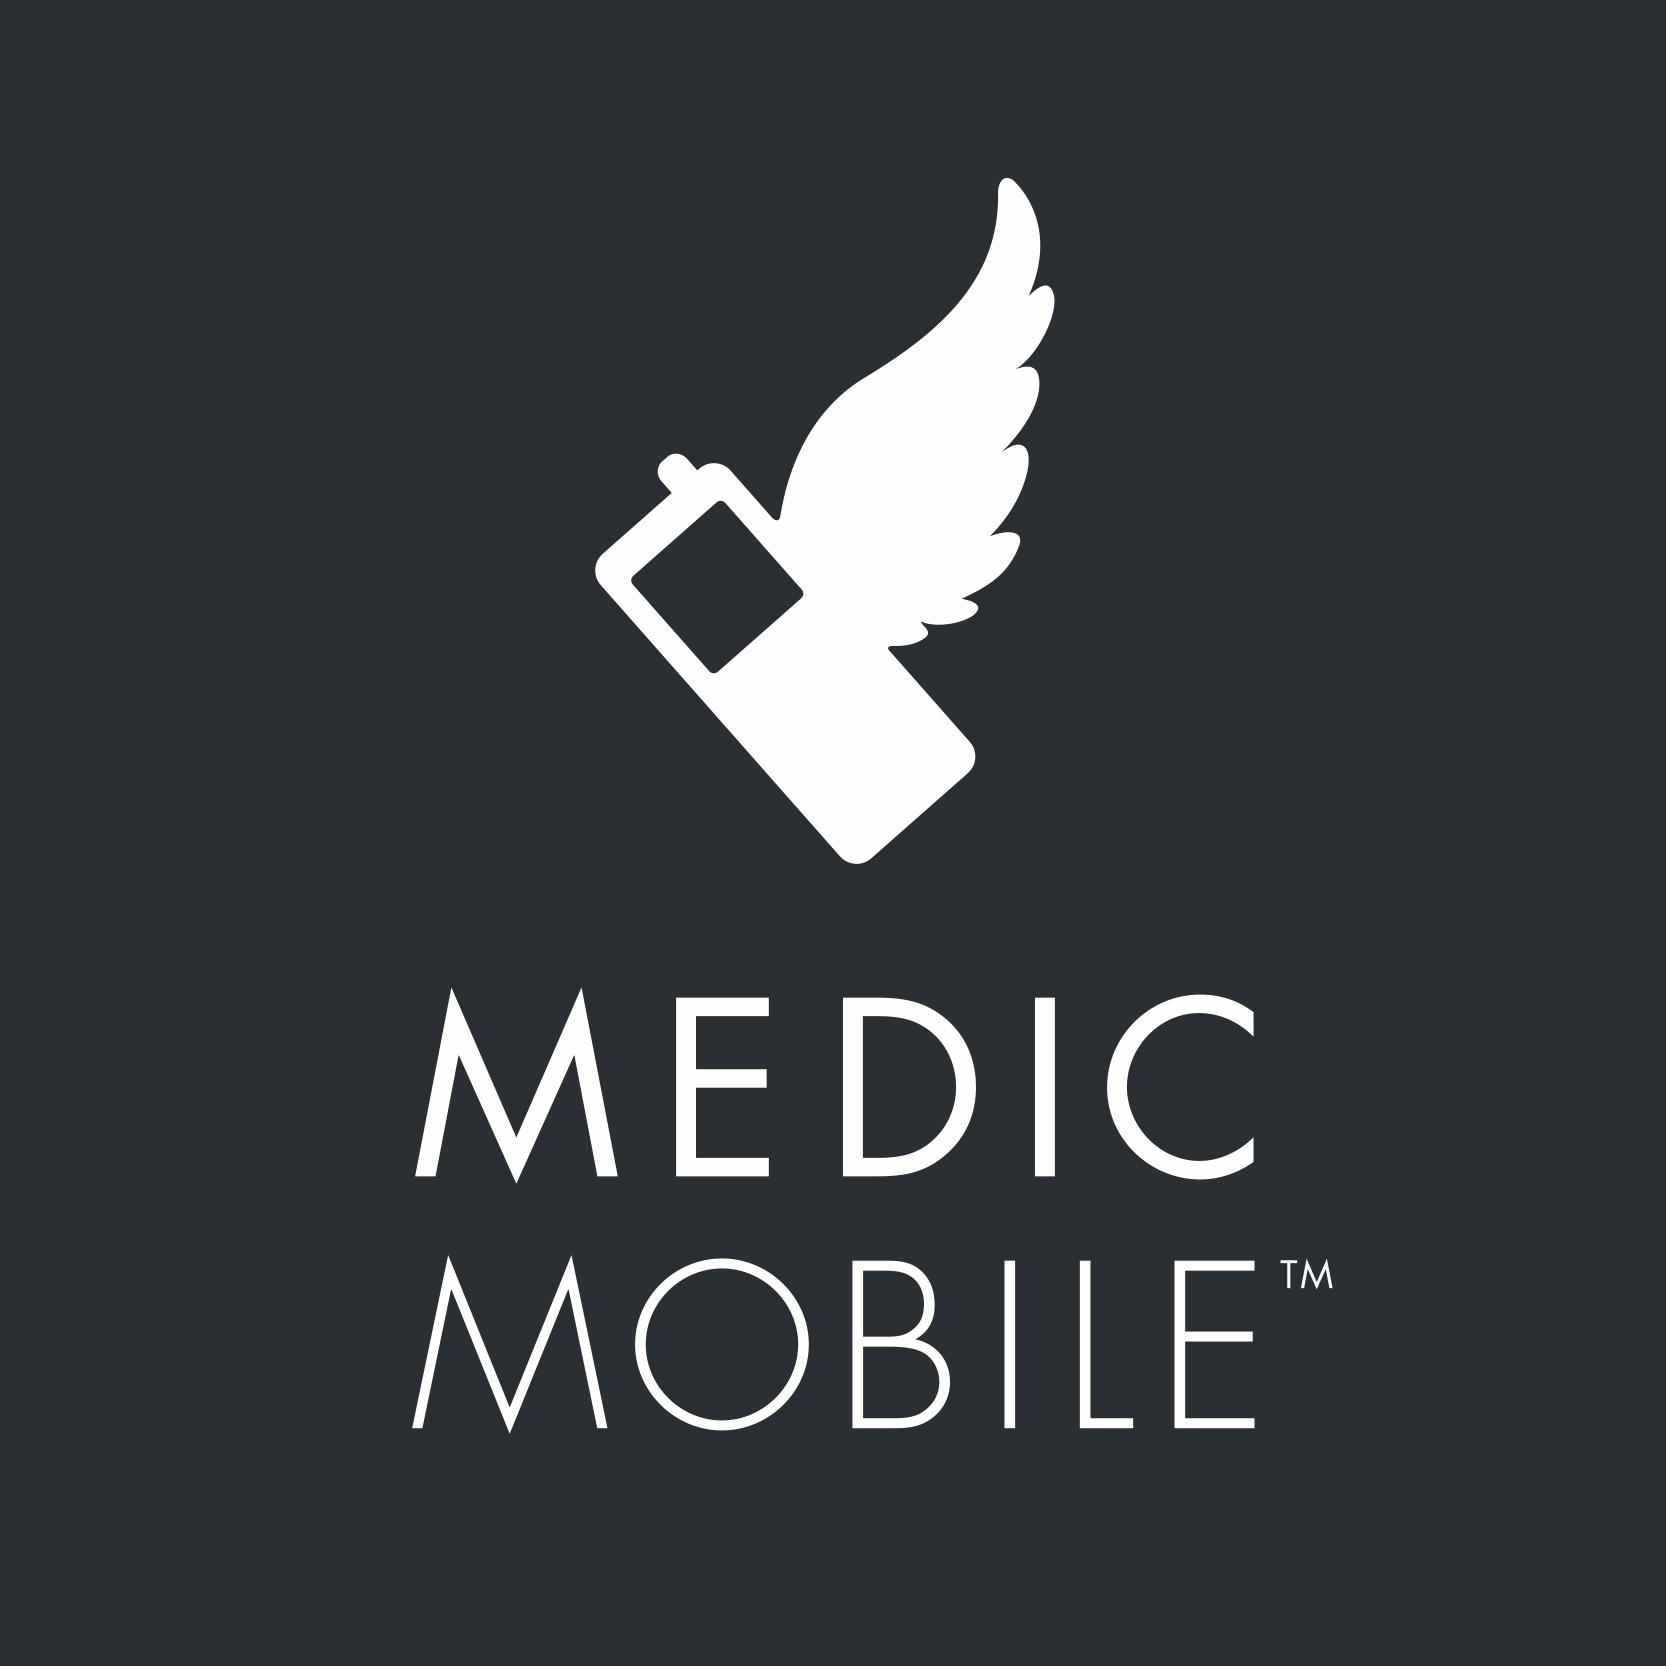 Medic-signature-reverse-sq copy.jpg